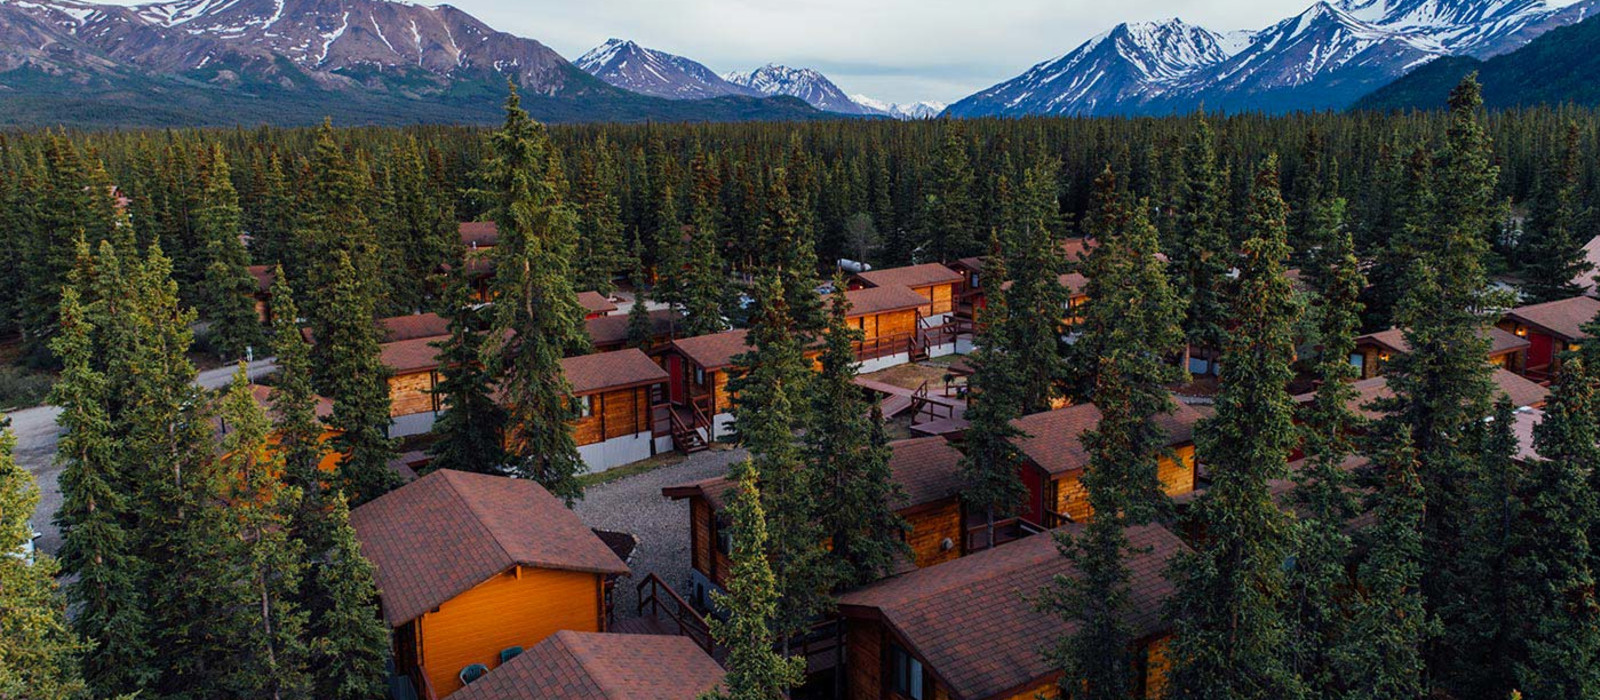 Hotel Denali Cabins Alaska